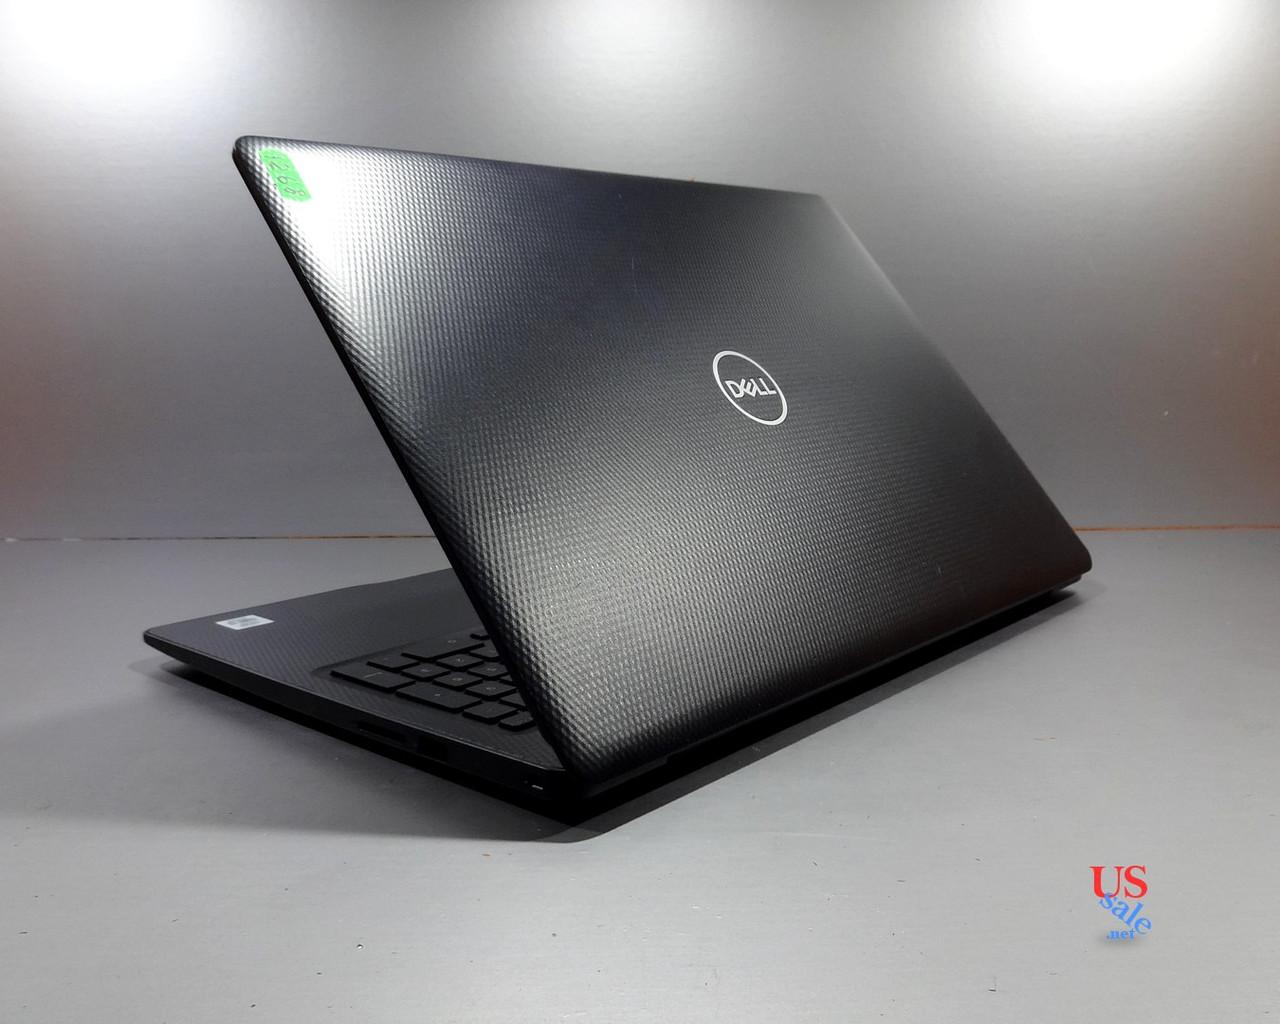 "Ноутбук Dell Inspiron 15-3593 15.6"", Intel Core i3-1005G1 1.2 Ghz, 8Gb DDR4, 2Tb. Гарантія!"